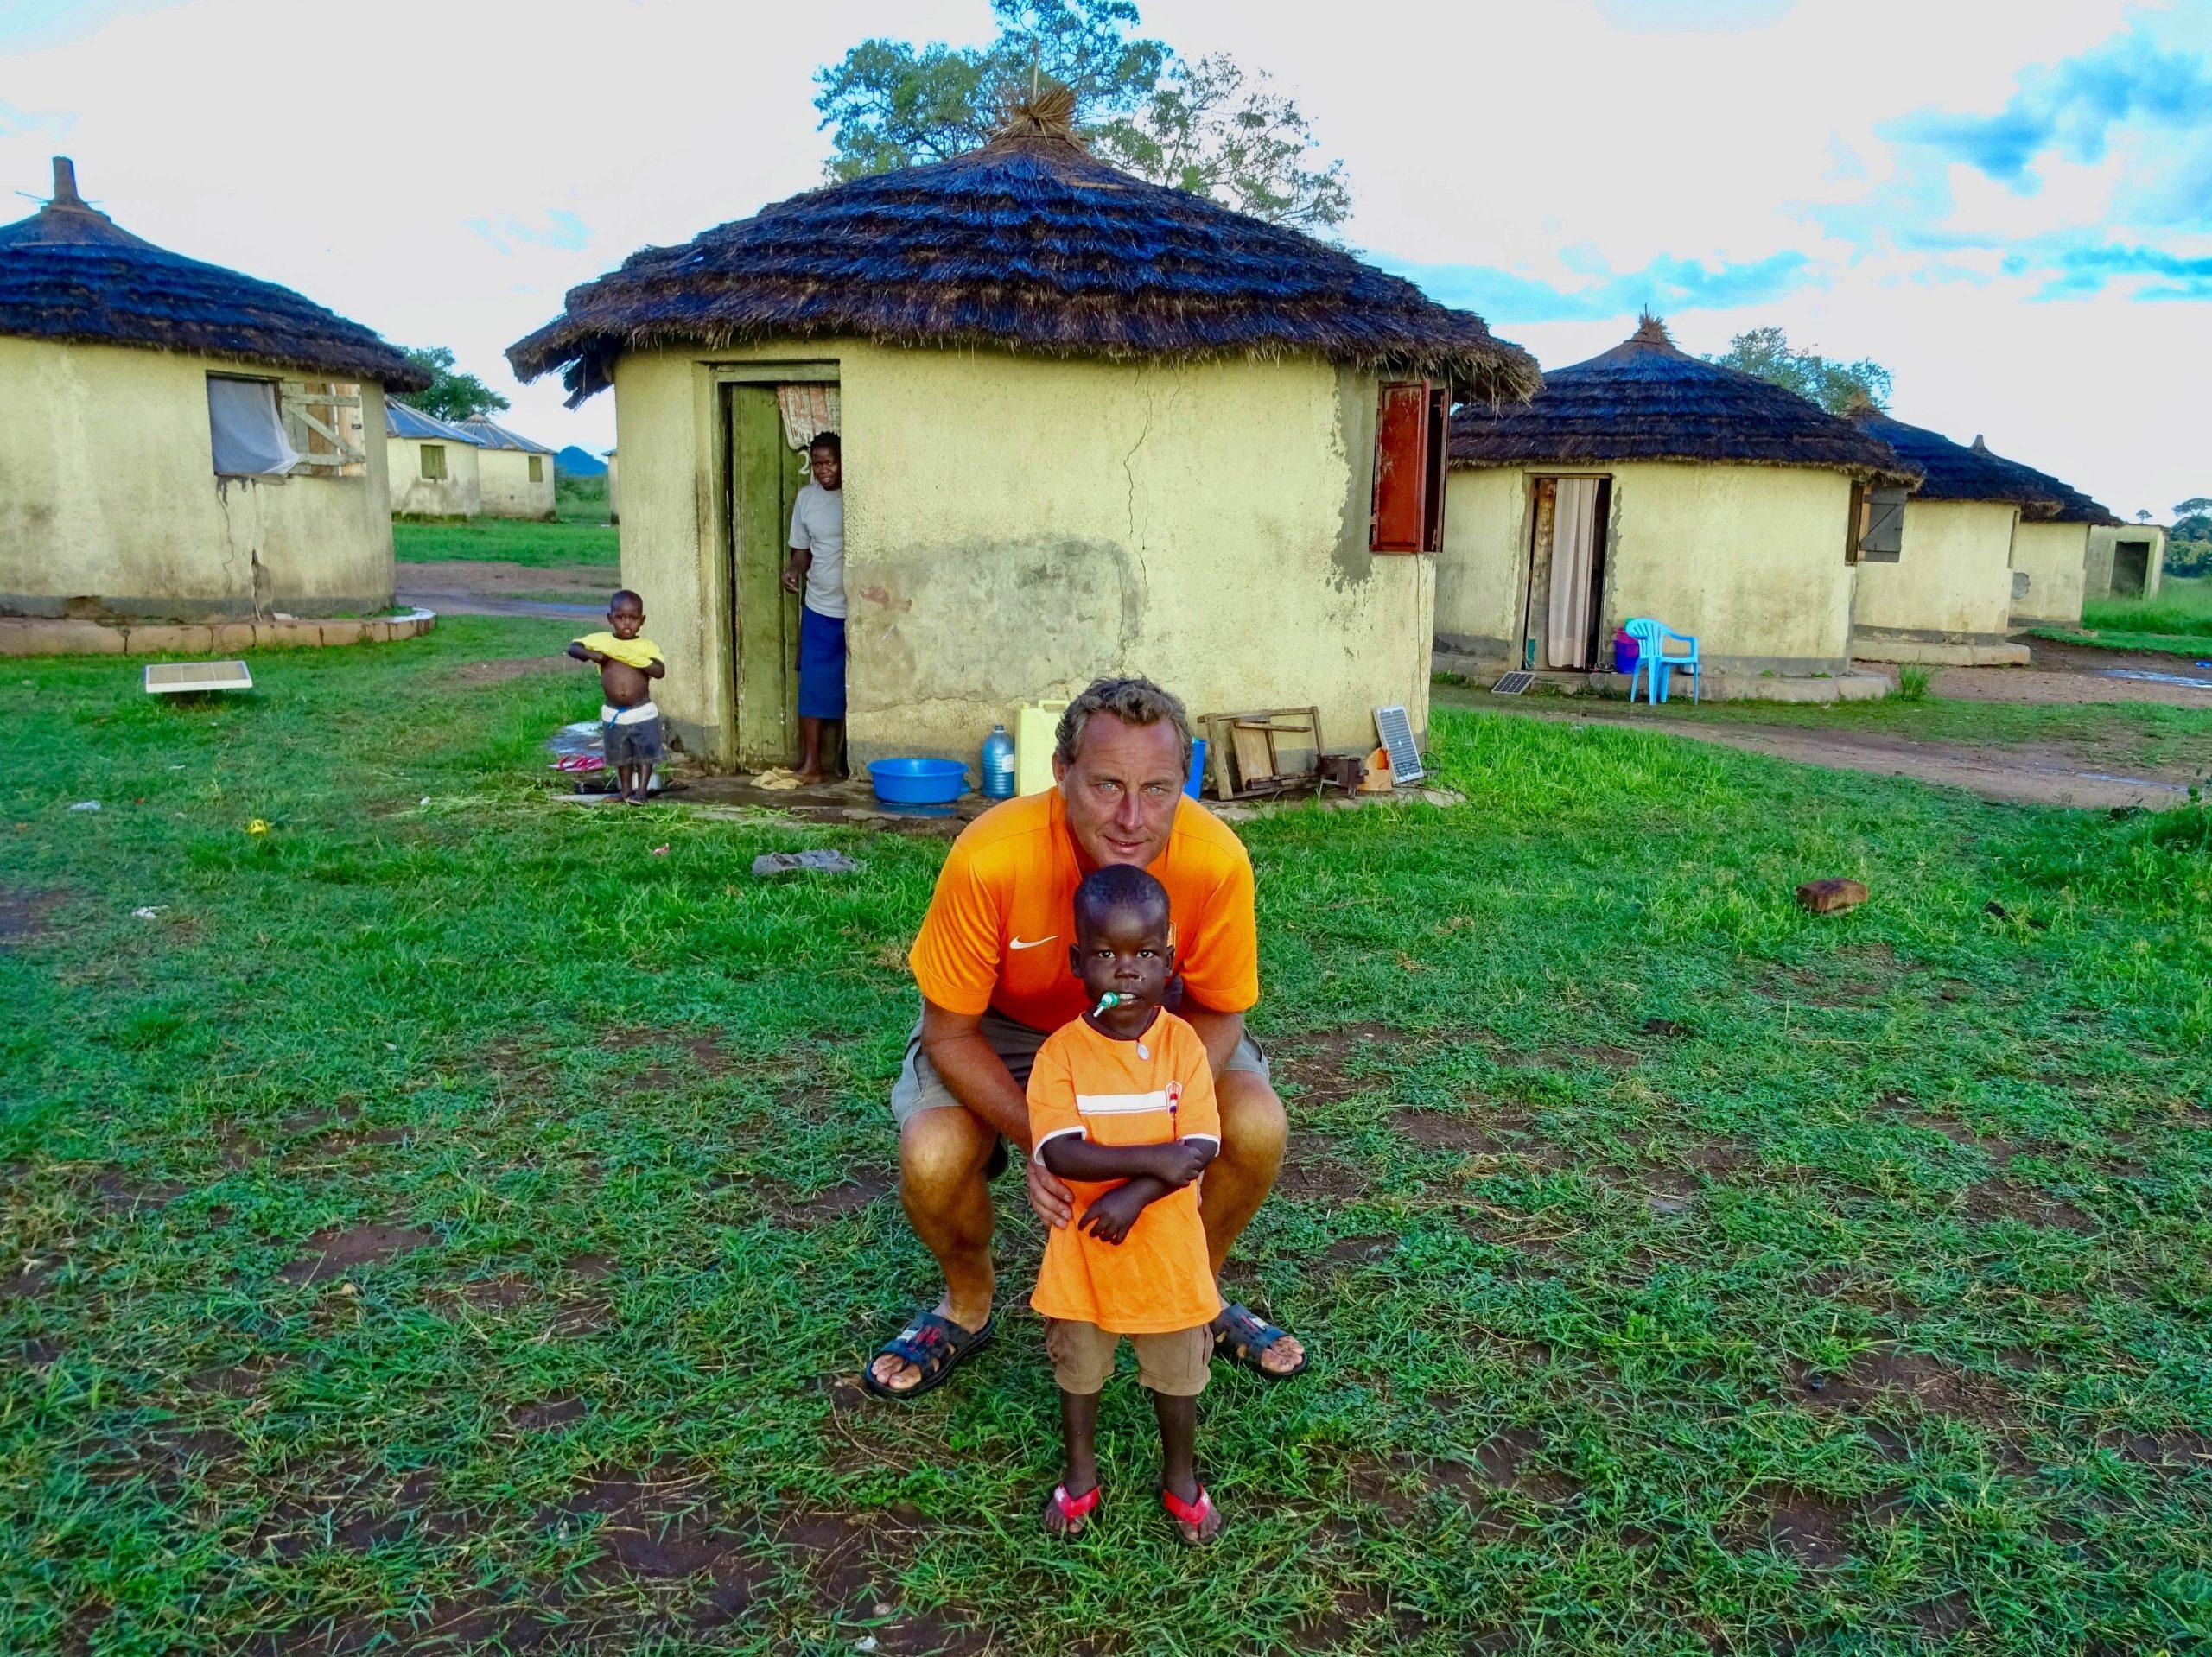 Mandela en ik in Oranje in het apoka kamp